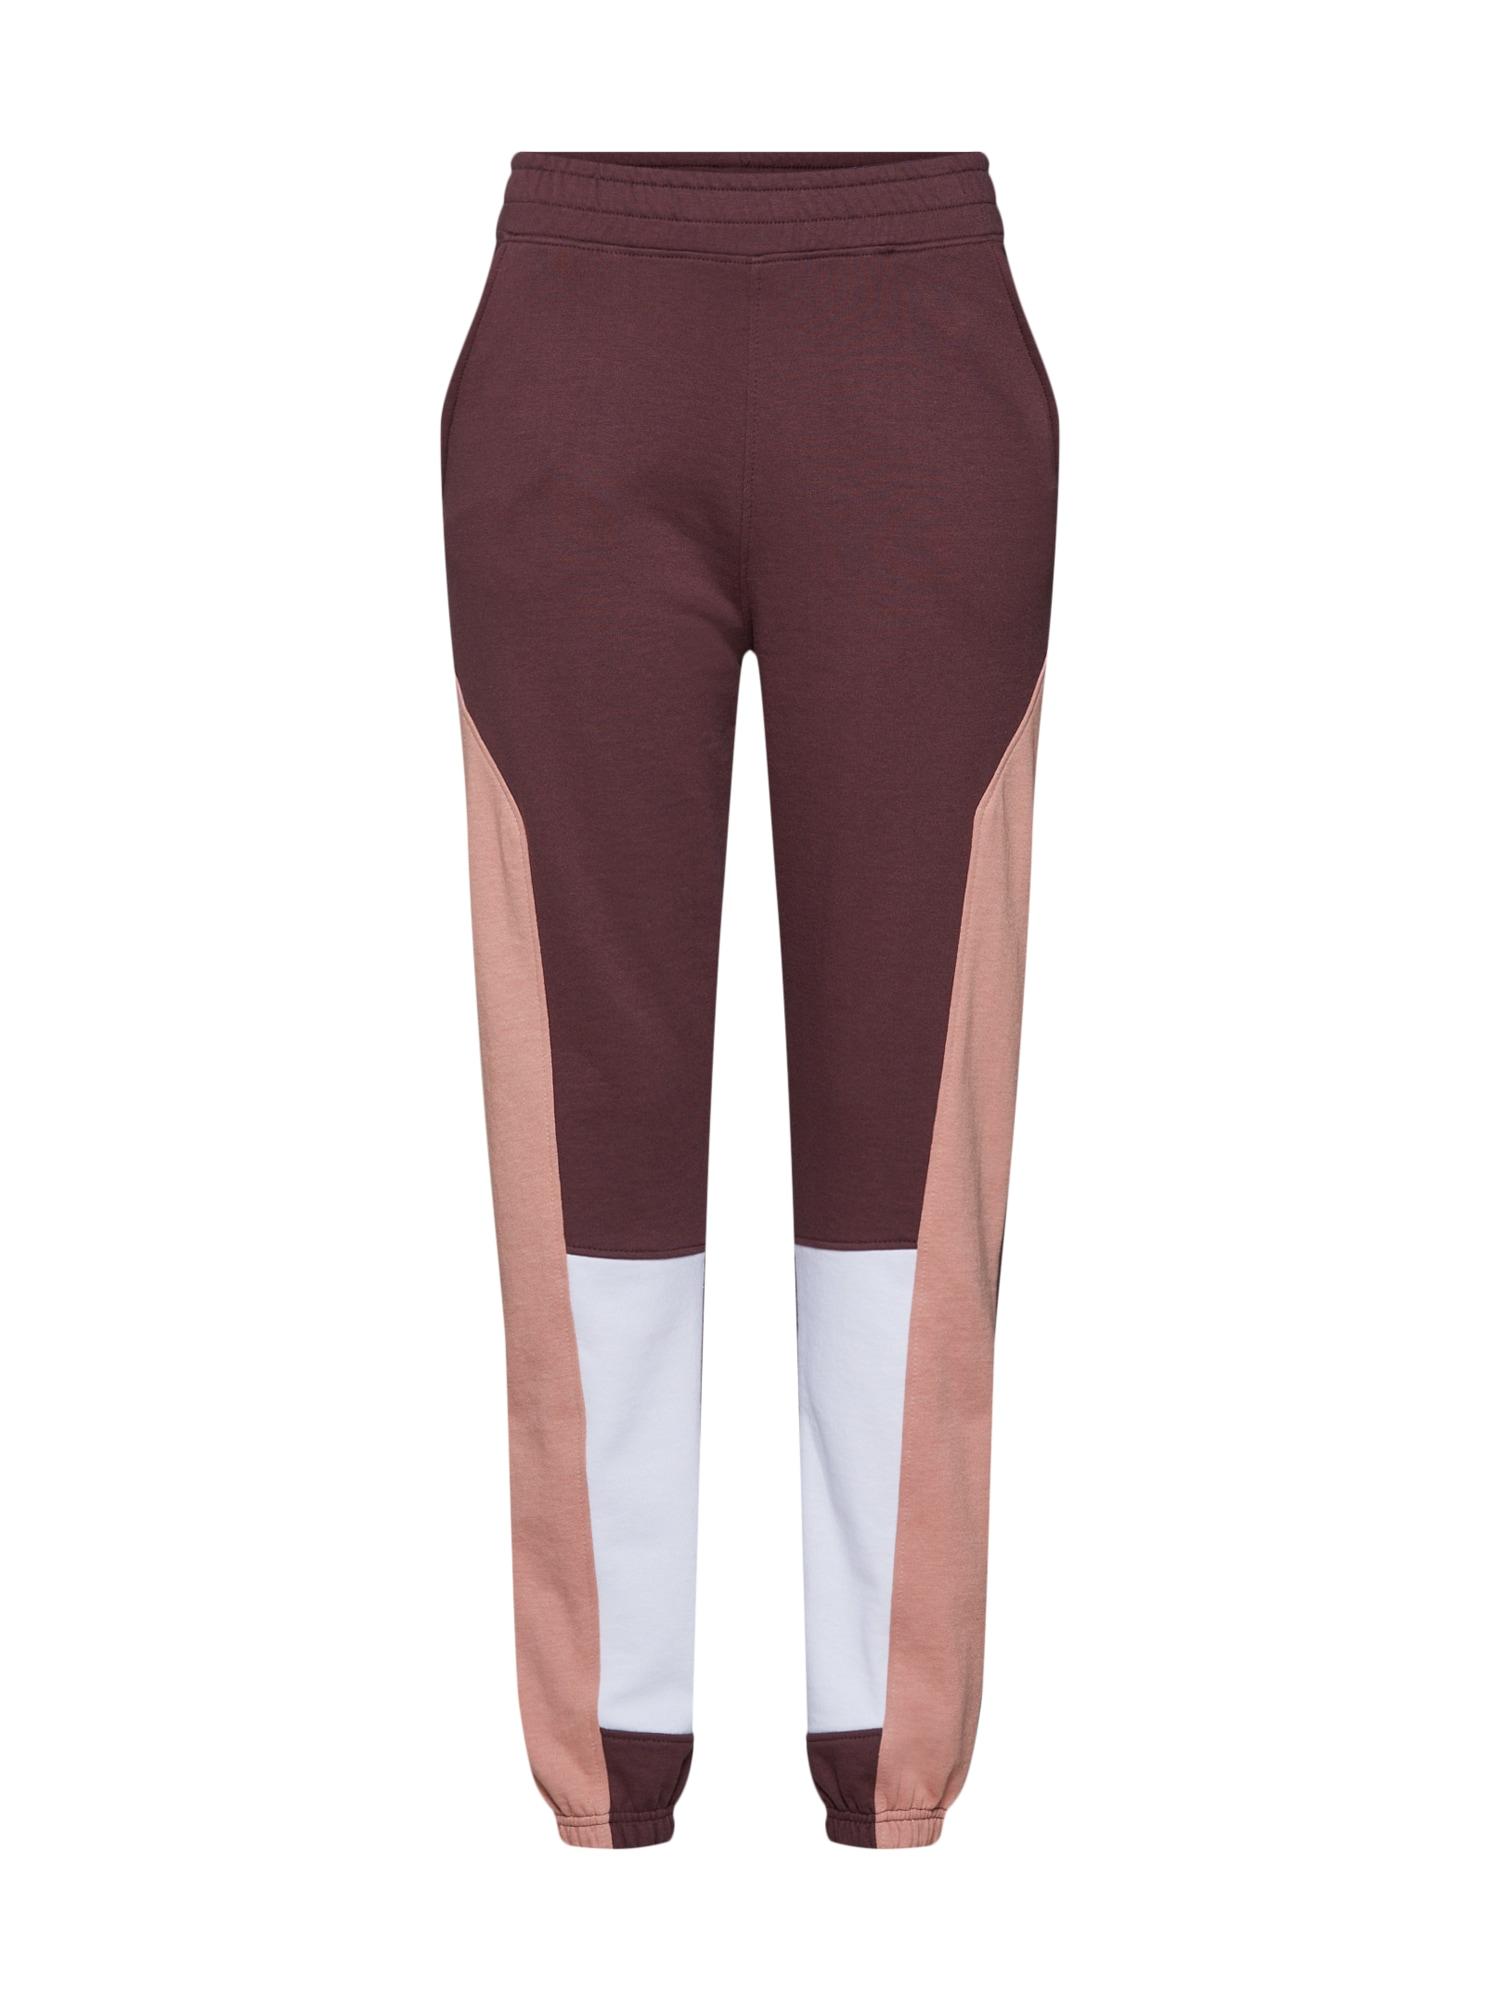 Kalhoty béžová hnědá bílá Missguided